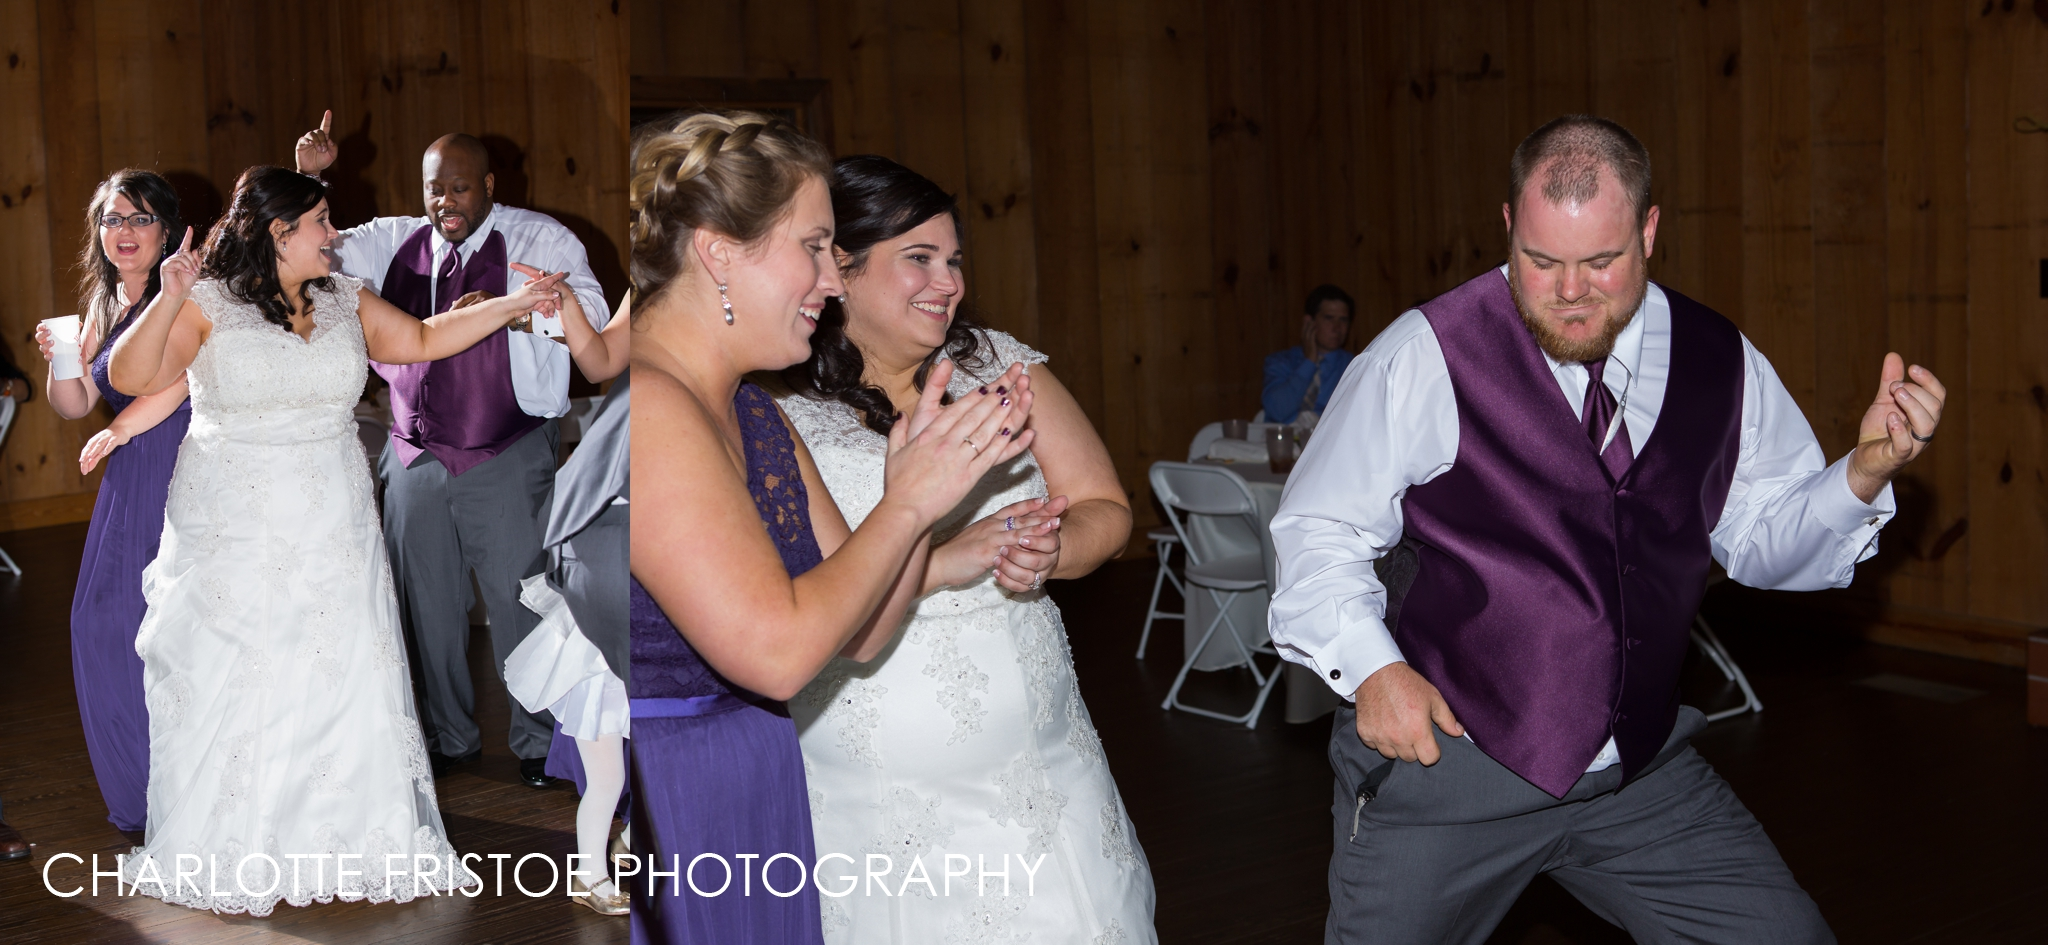 Lake Iamonia Wedding Charlotte Fristoe Photography-71.jpg